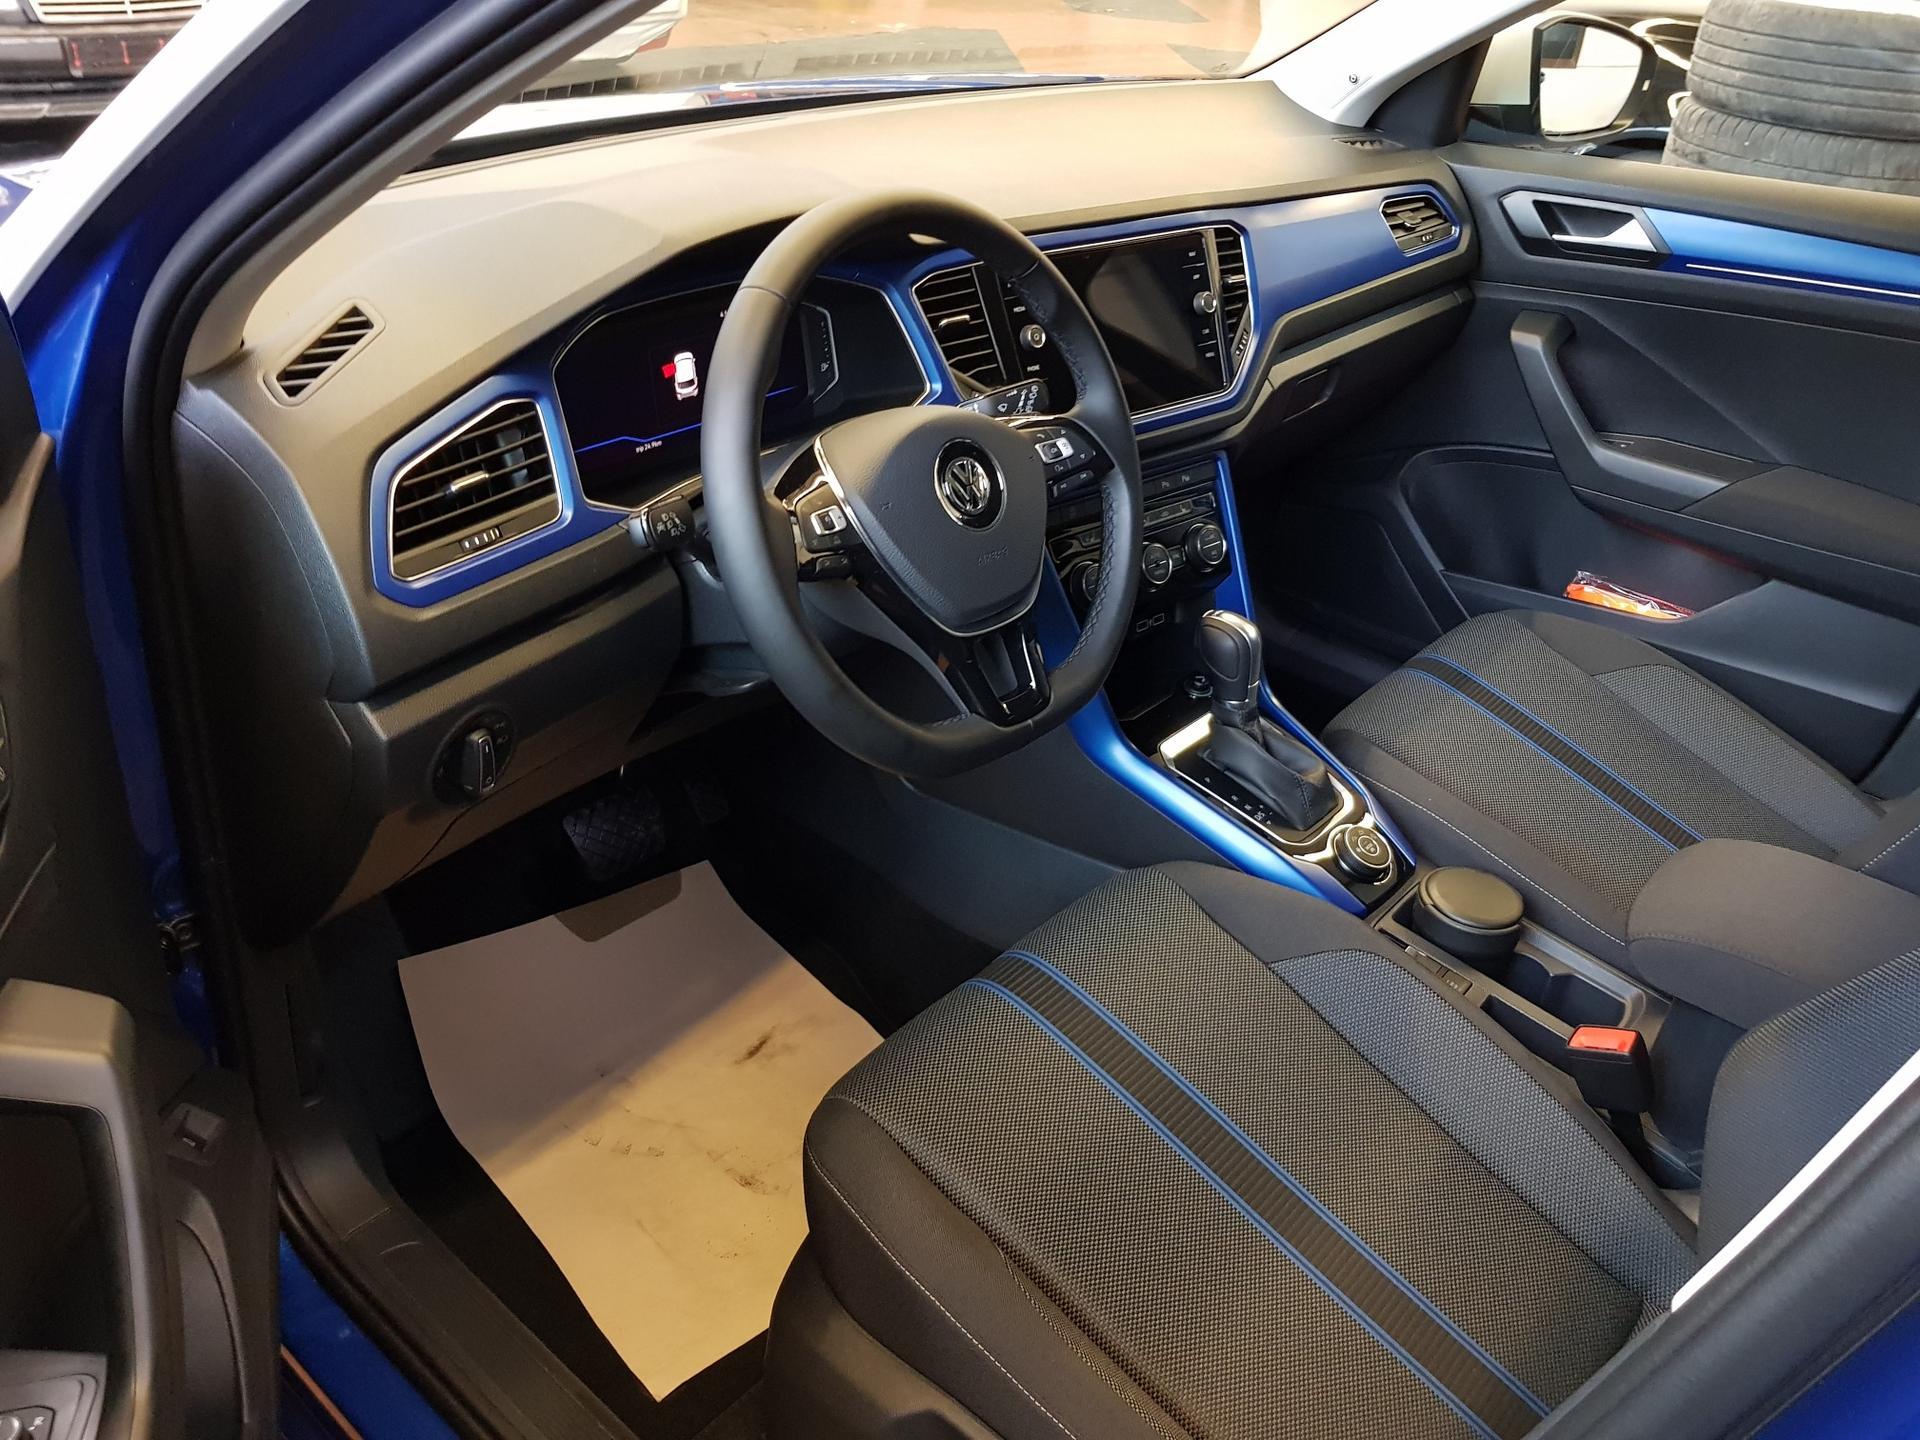 volkswagen t roc sport 2 0tdi 110kw 150ps 4 motion dsg 7. Black Bedroom Furniture Sets. Home Design Ideas